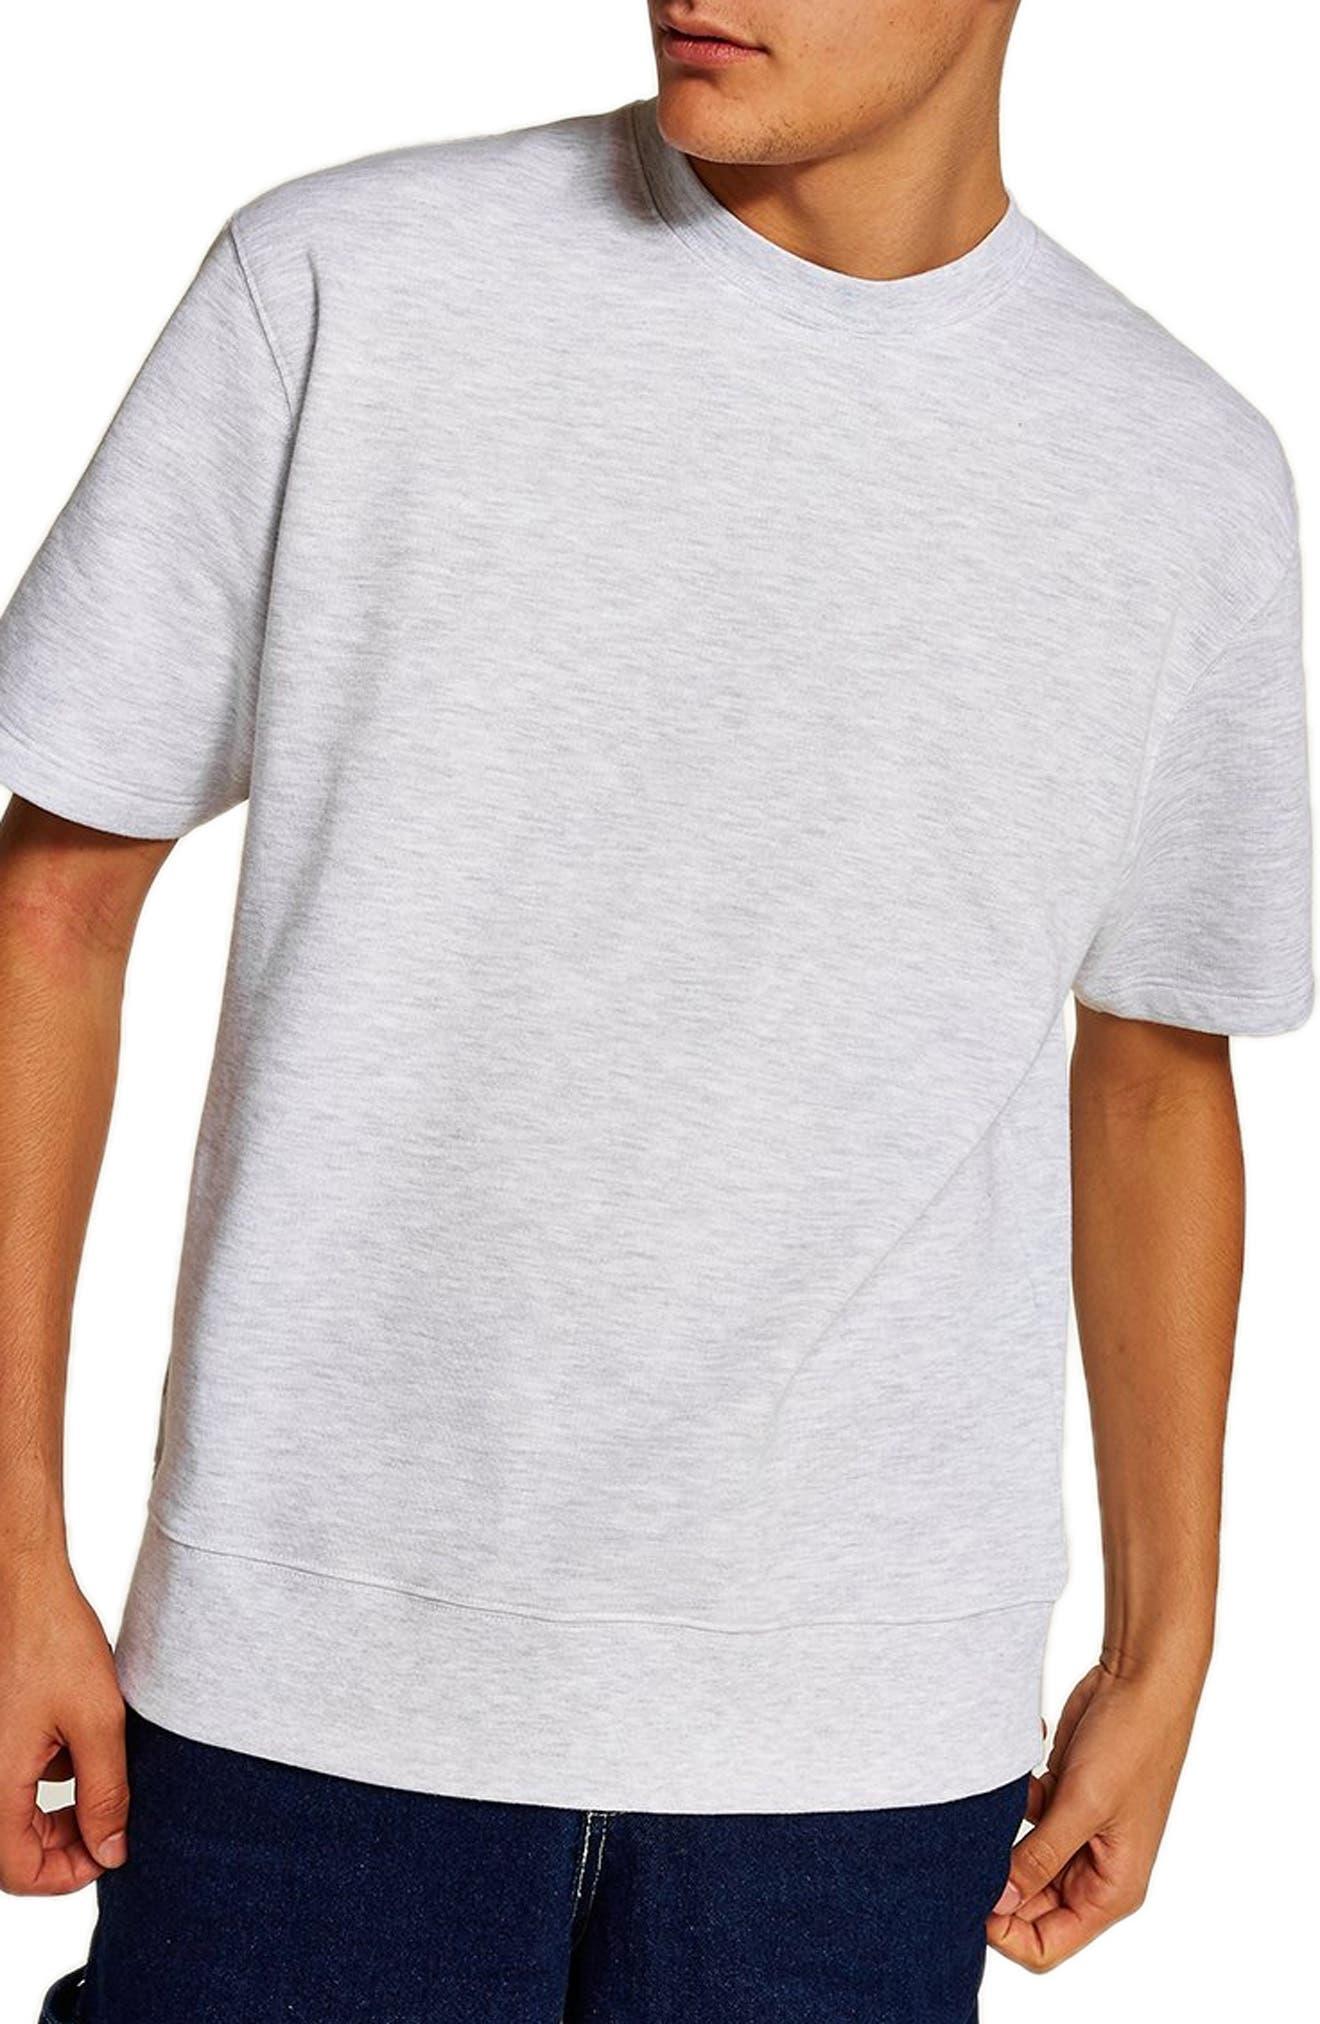 Short Sleeve Crewneck Sweatshirt, Main, color, LIGHT GREY